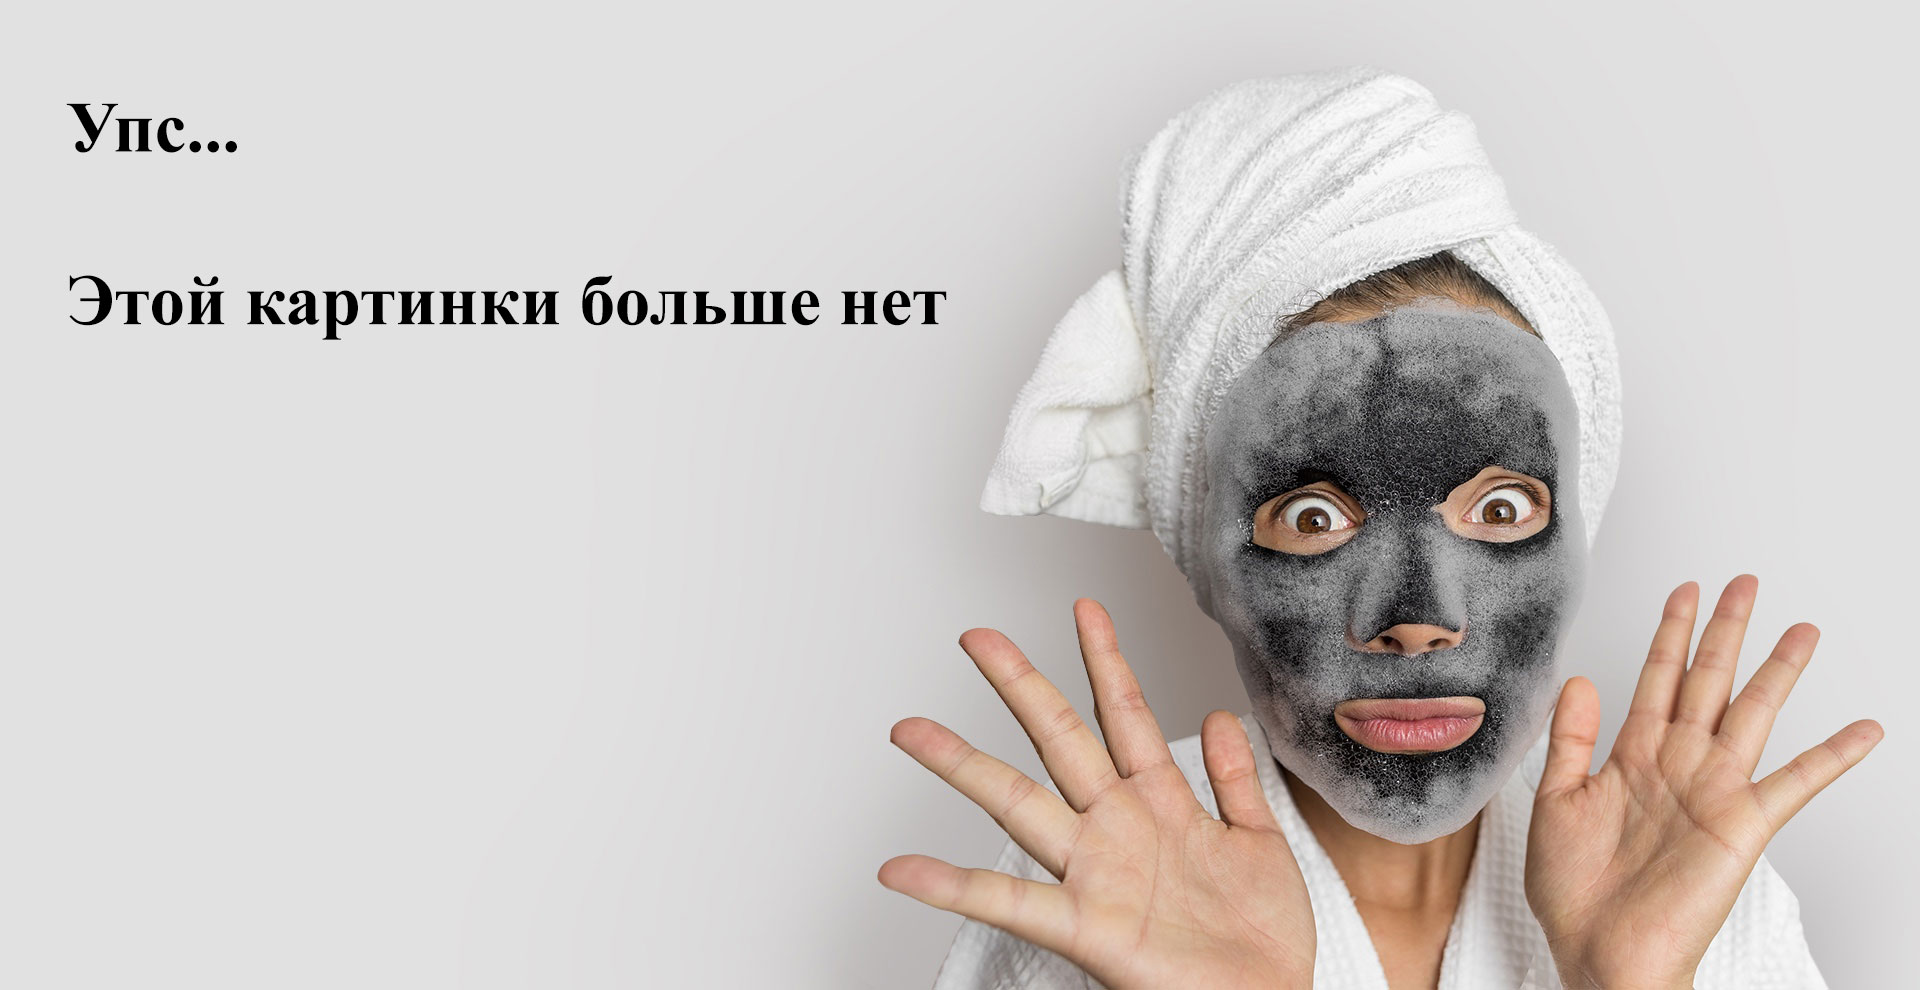 Дезиптол, дезинфицирующий спрей (кожный антисептик), 100 мл